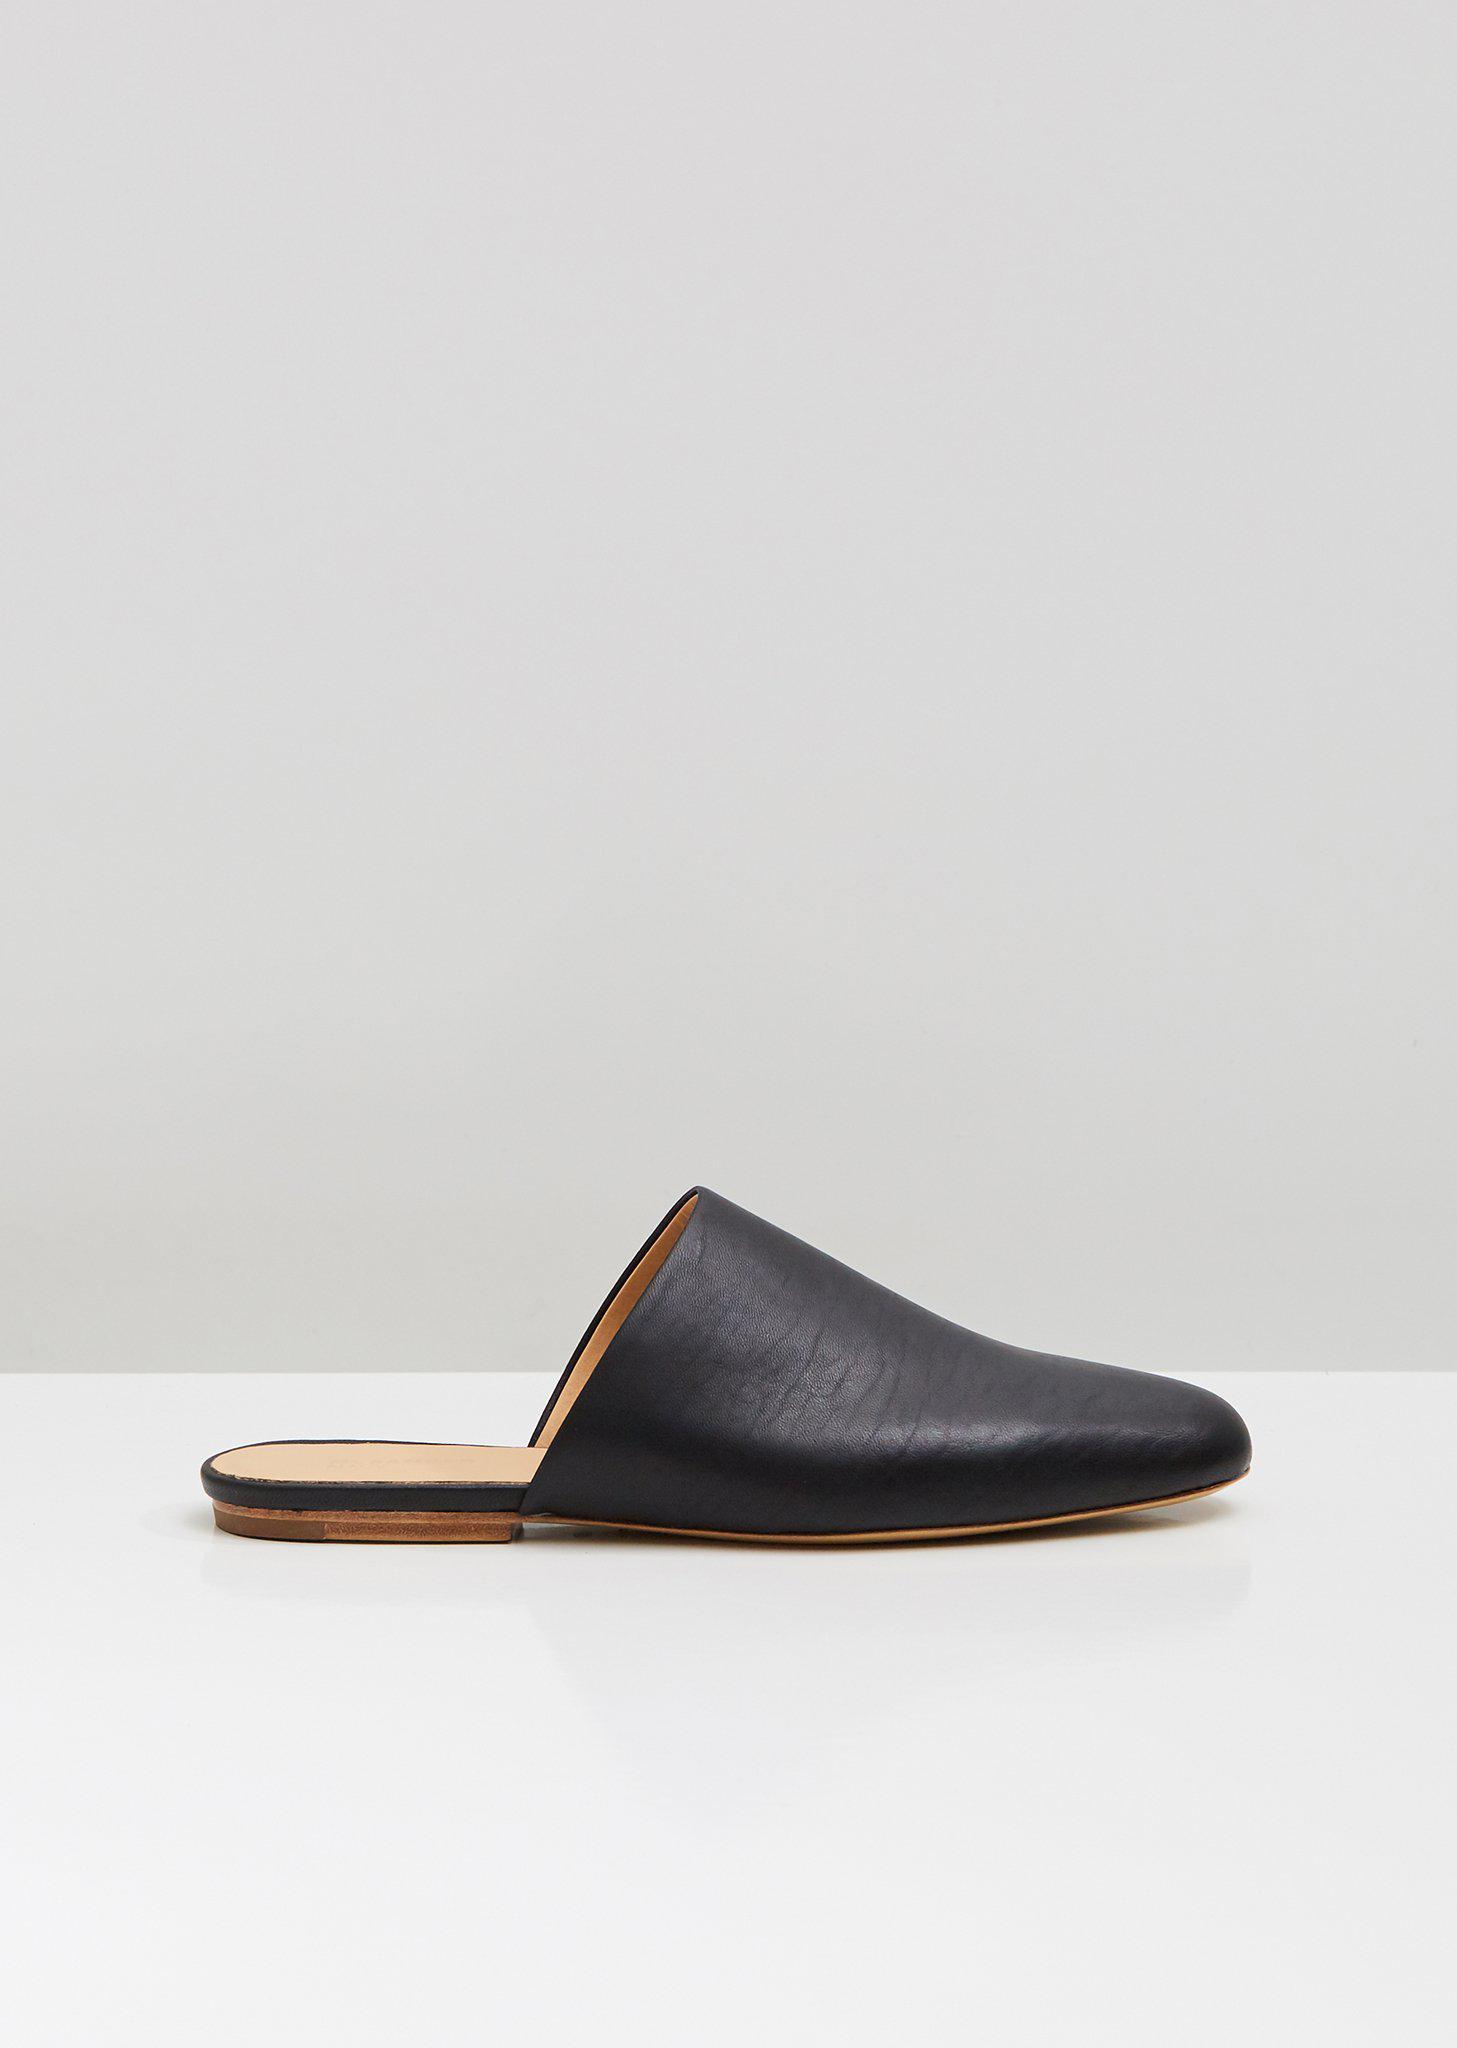 5ff3b14e2e39 Lyst - Jil Sander Navy Jn32001a (black) Women s Flat Shoes in Black